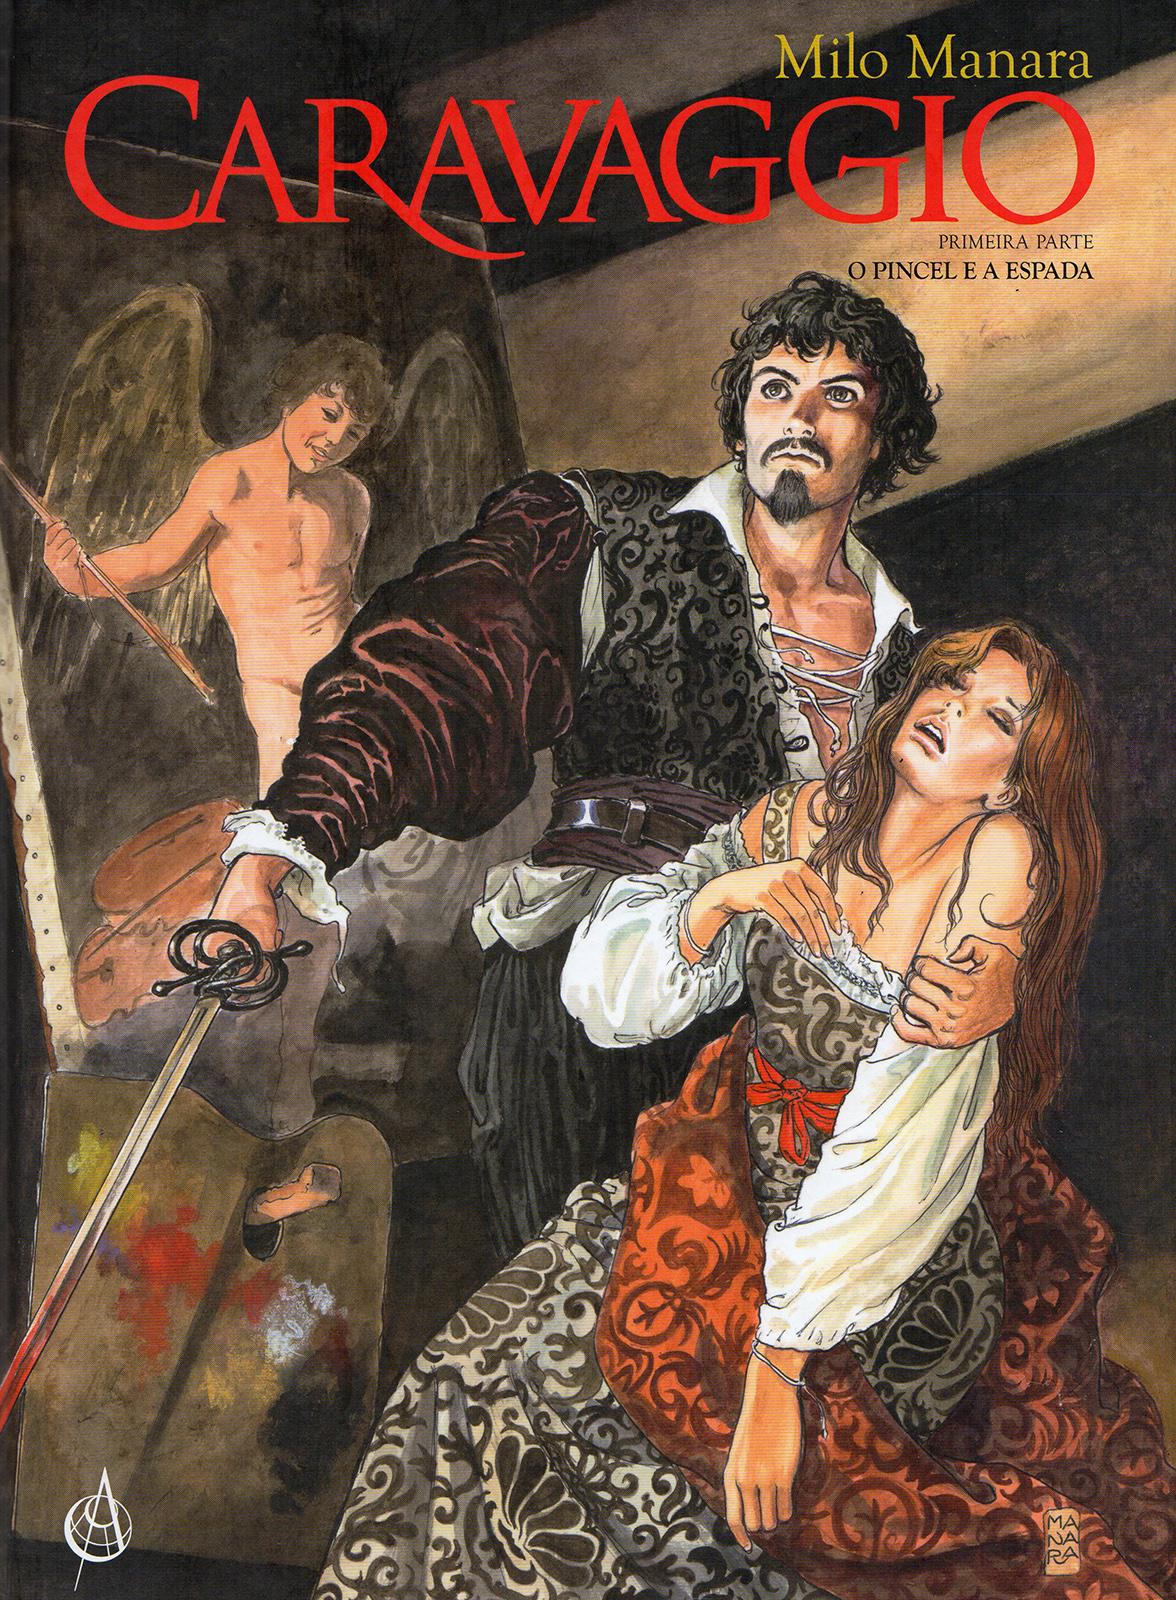 Caravaggio 1 O pincel e a espada Capa